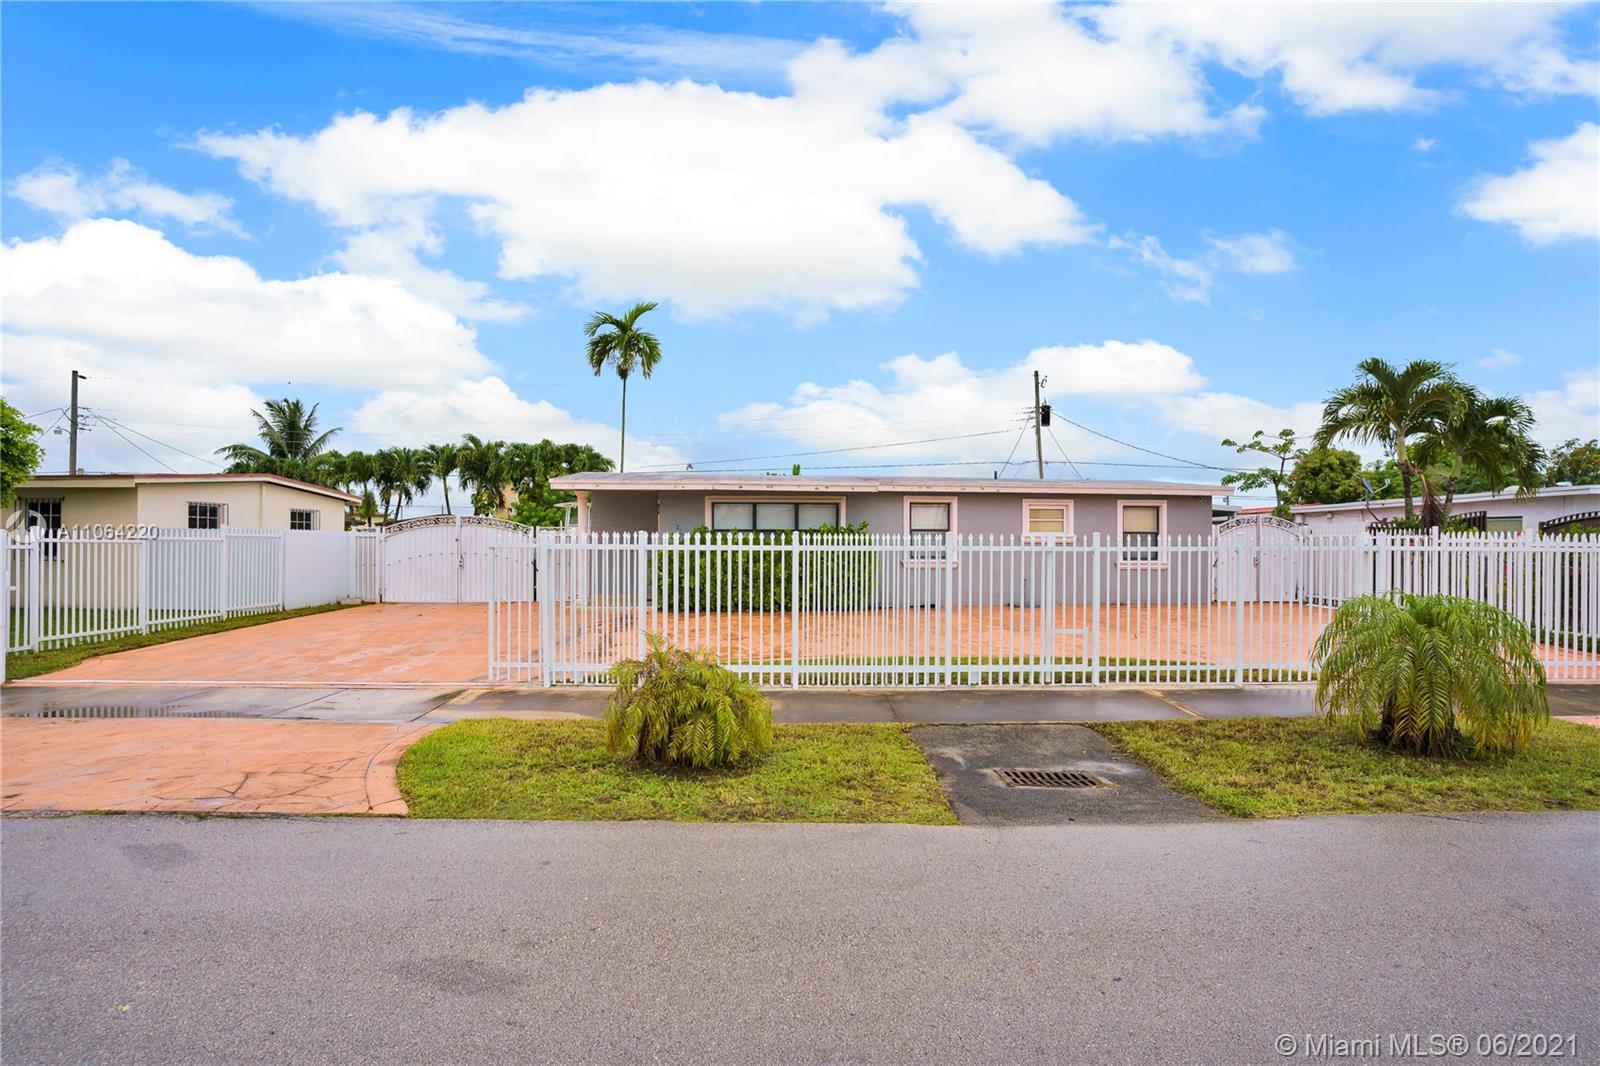 Westwood Lake - 5101 SW 116th Ave, Miami, FL 33165